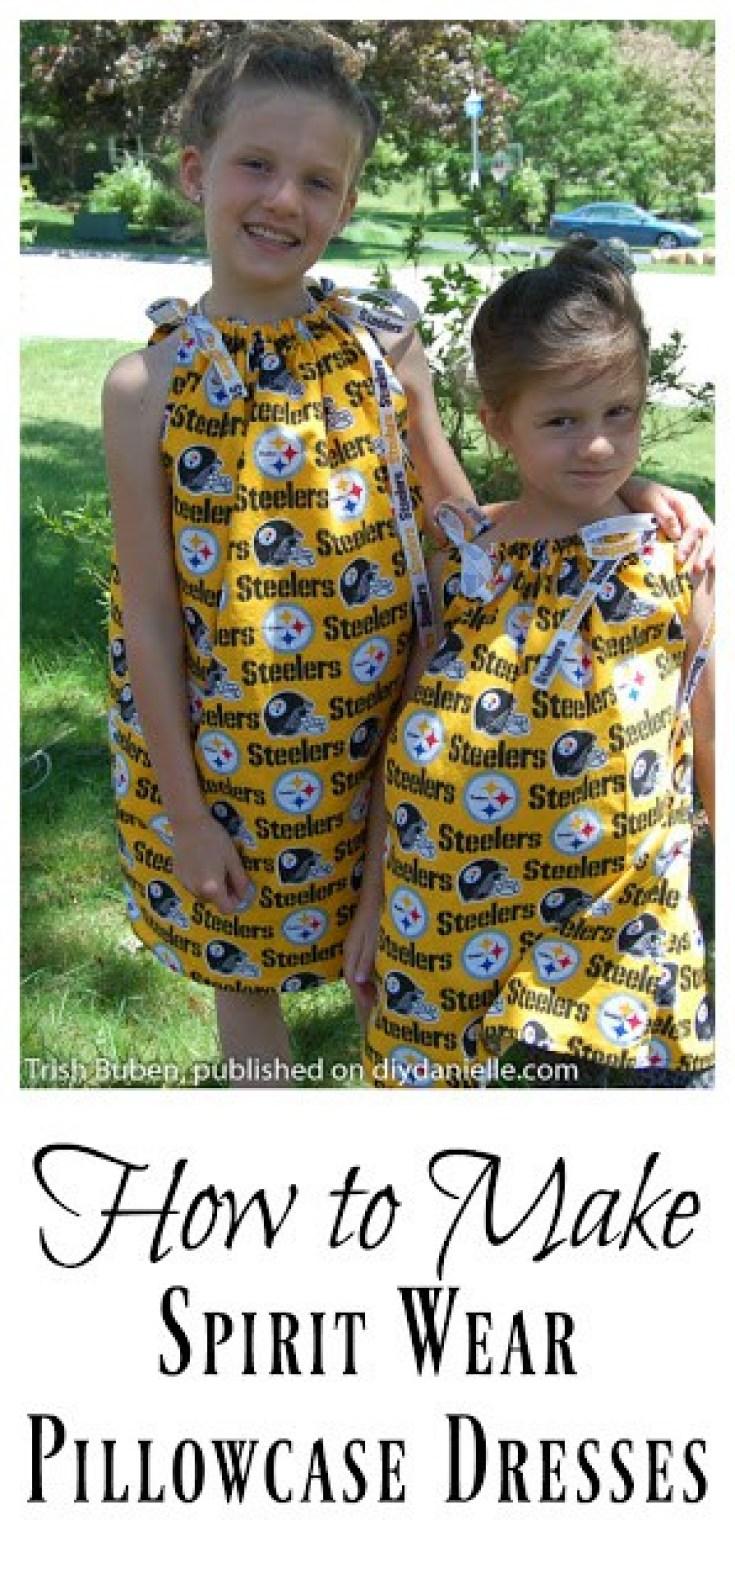 Sew an Easy Pillowcase Dress for Football Season!